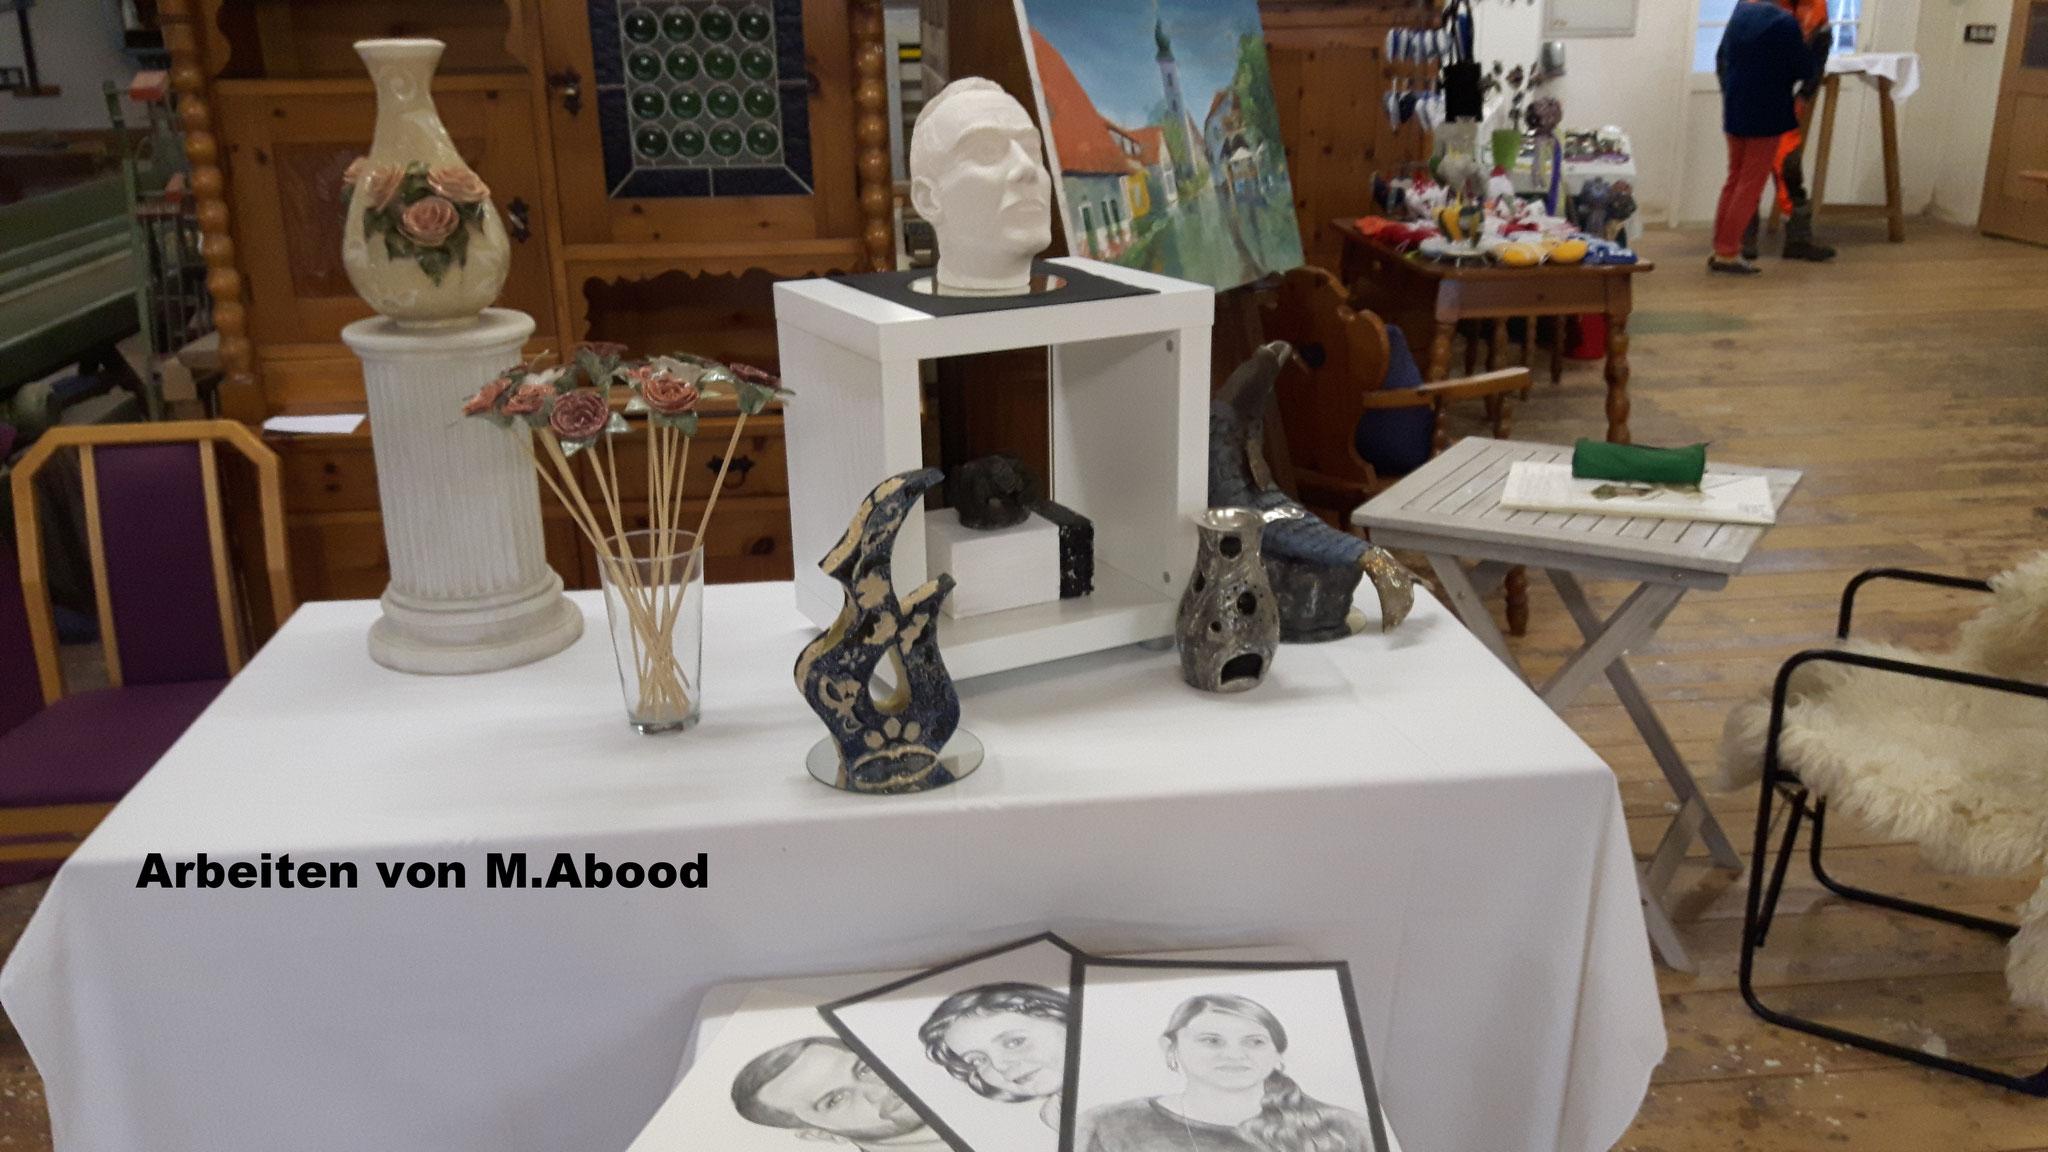 Keramik, Bilder u.a.m.